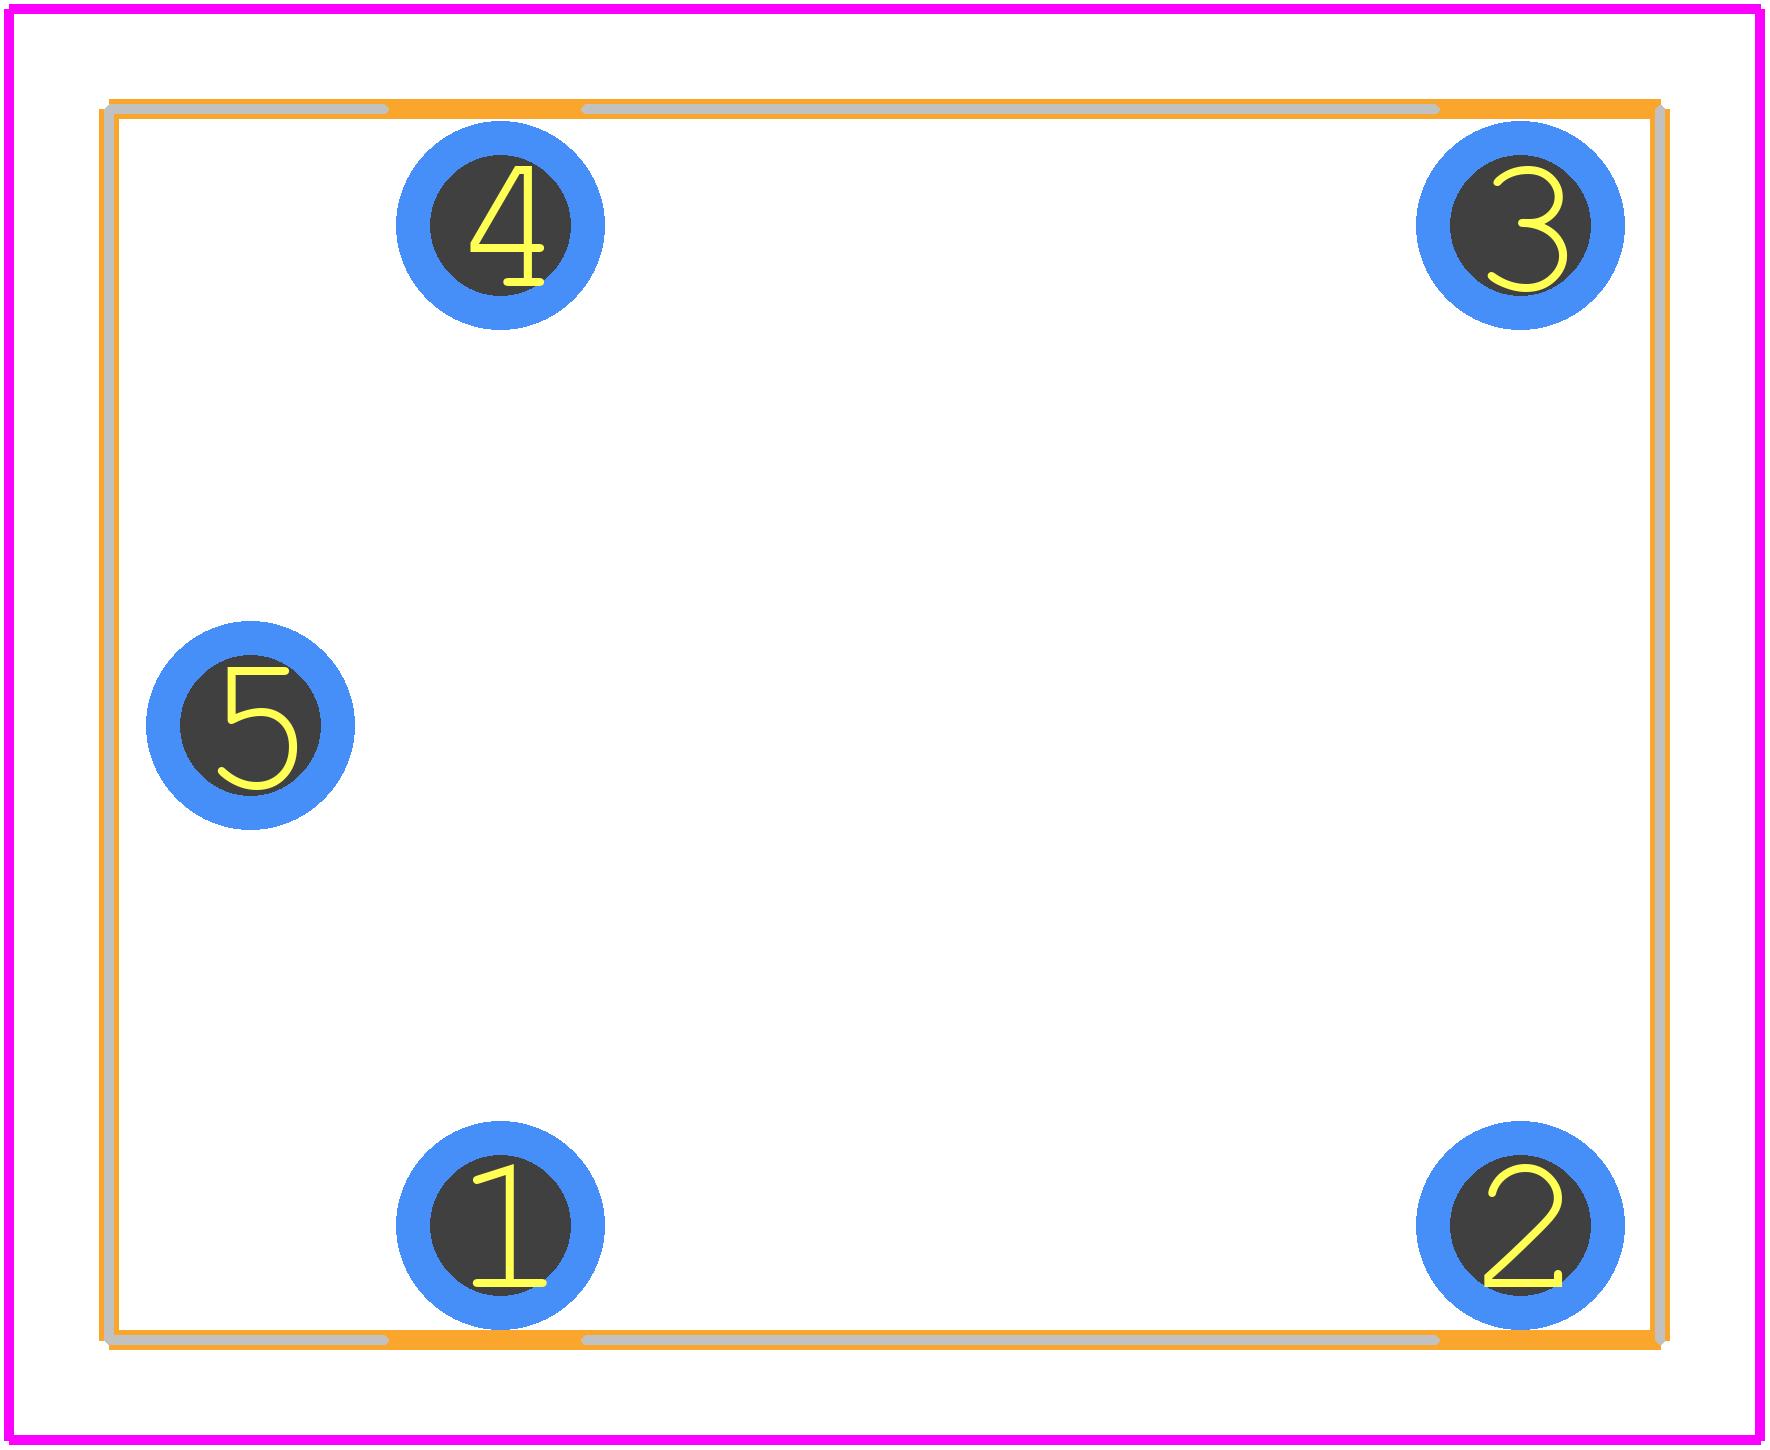 Sra 12vdc Cl Songle Relay Pcb Footprint Symbol Download Dpdt 12v Datasheet Other